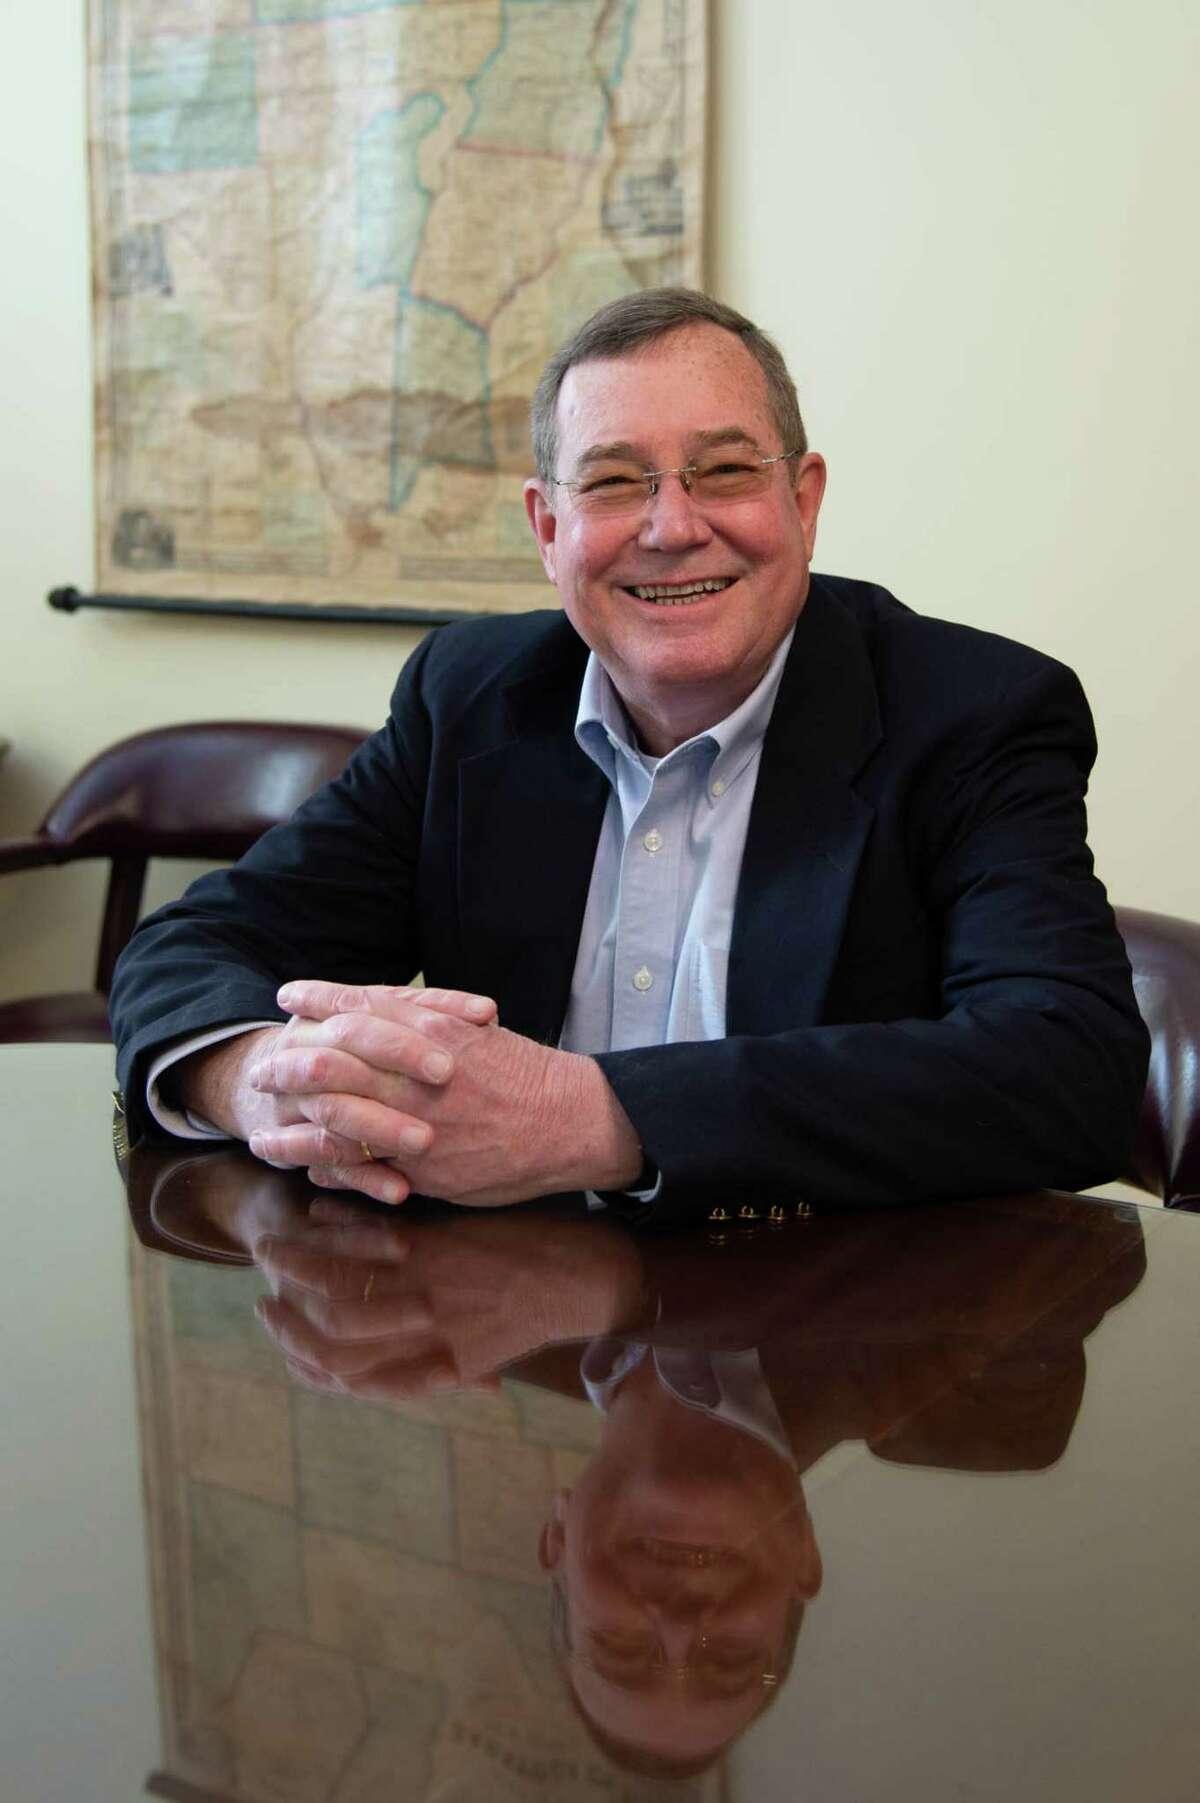 Mayor of Ballston Spa Larry Woolbright.